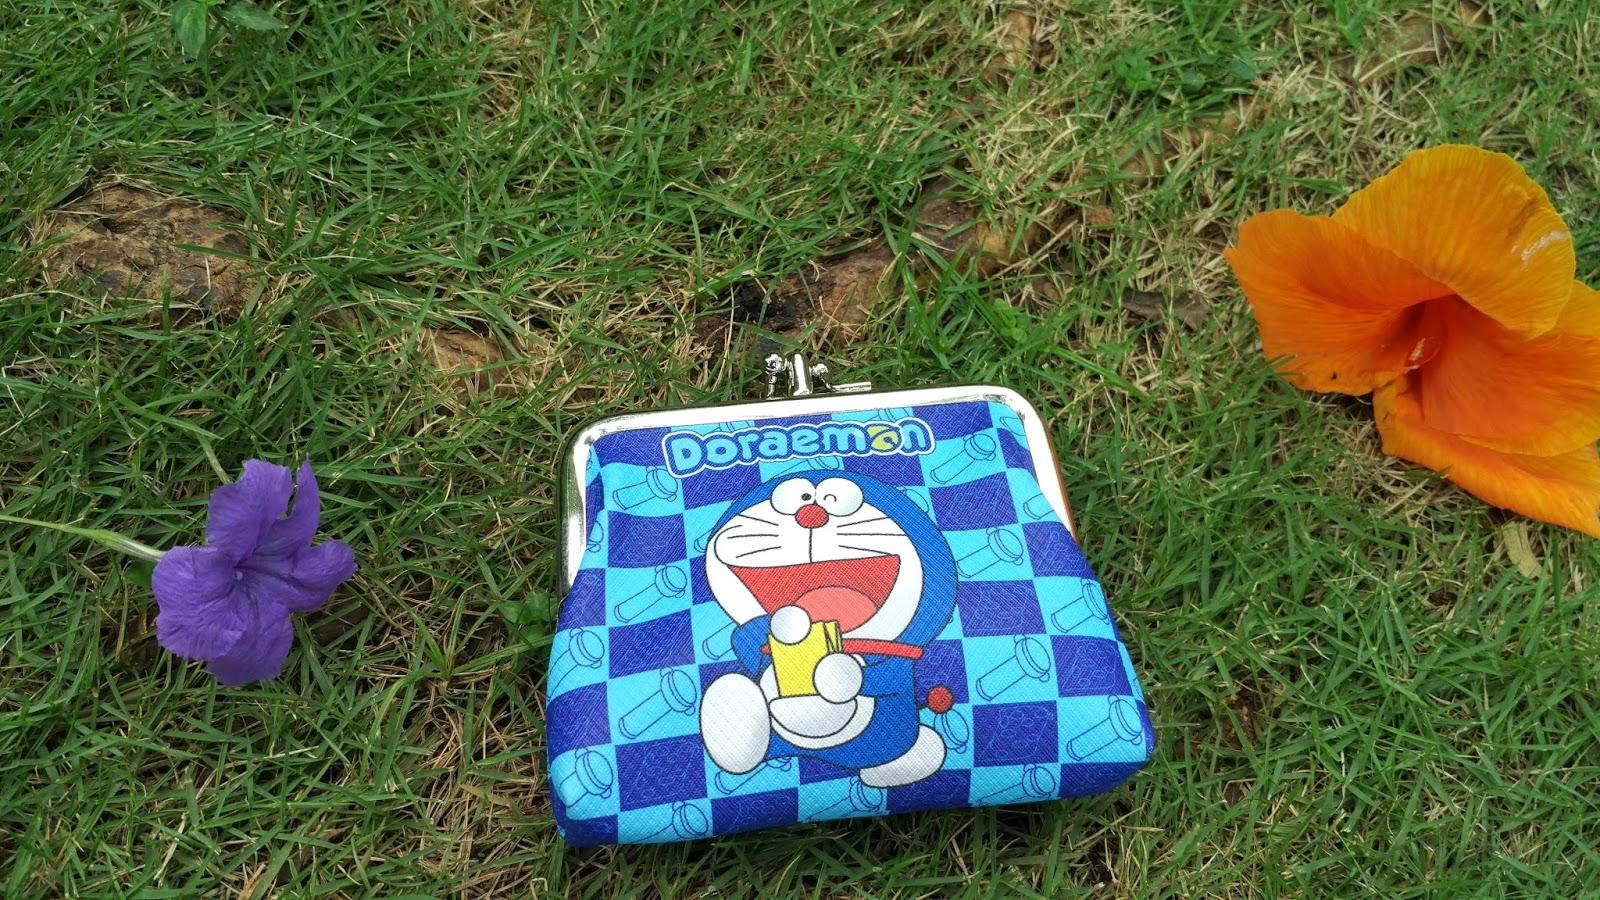 Dompet Koin Doraemon Dual Kantong, Dompet koin, dompet doraemon, dompet cewek, dompet anak, dompet kecil, dompet klip, dompet import